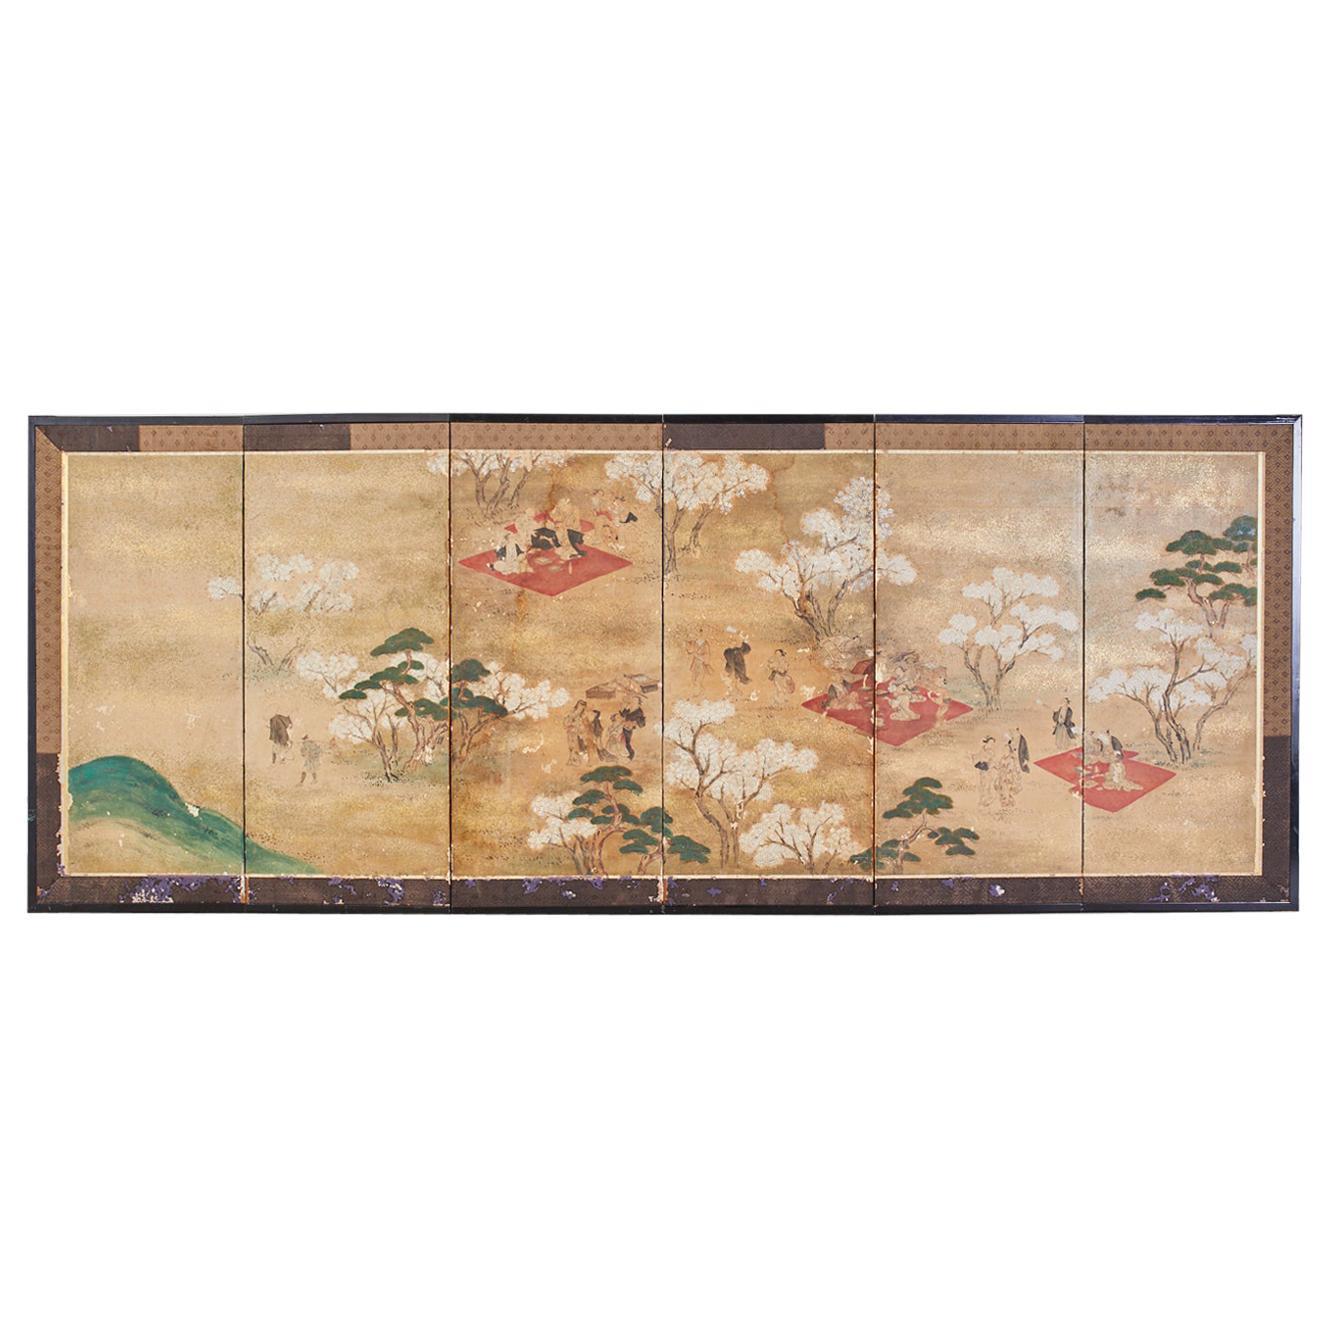 Japanese Edo Six-Panel Screen Feasting Under Cherry Blossoms